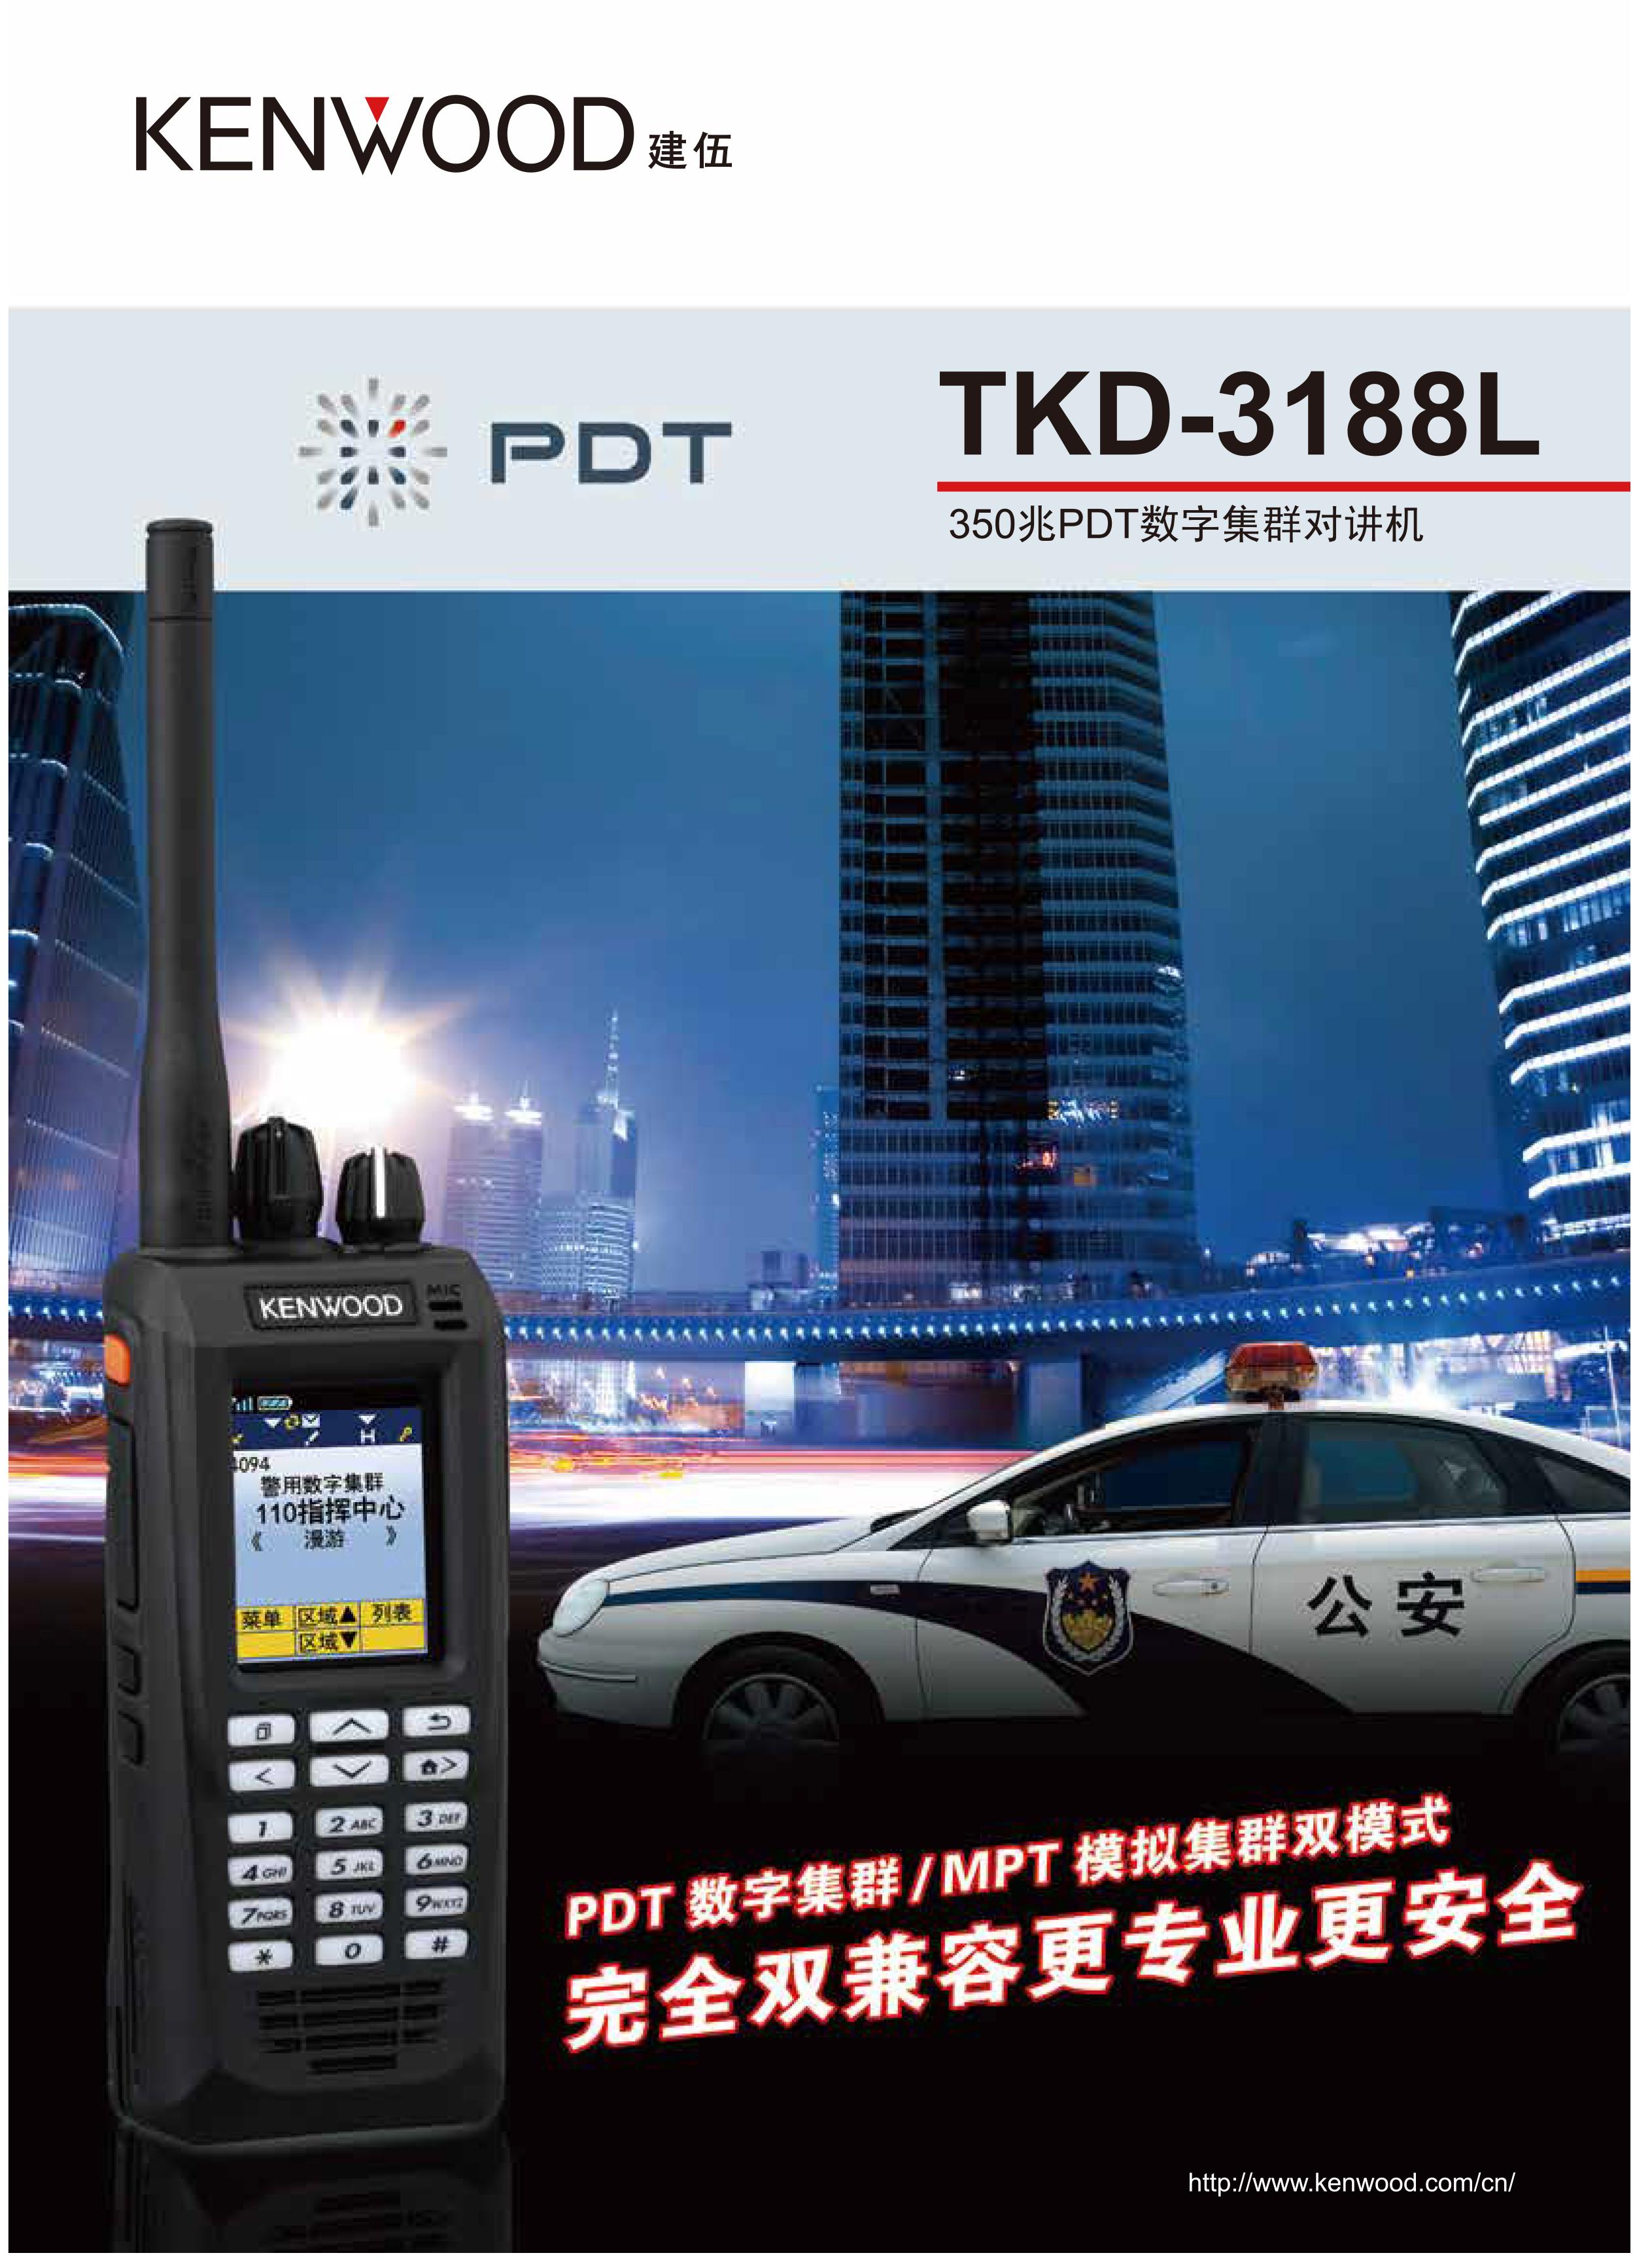 TKD-3188L数字对讲机彩页_01